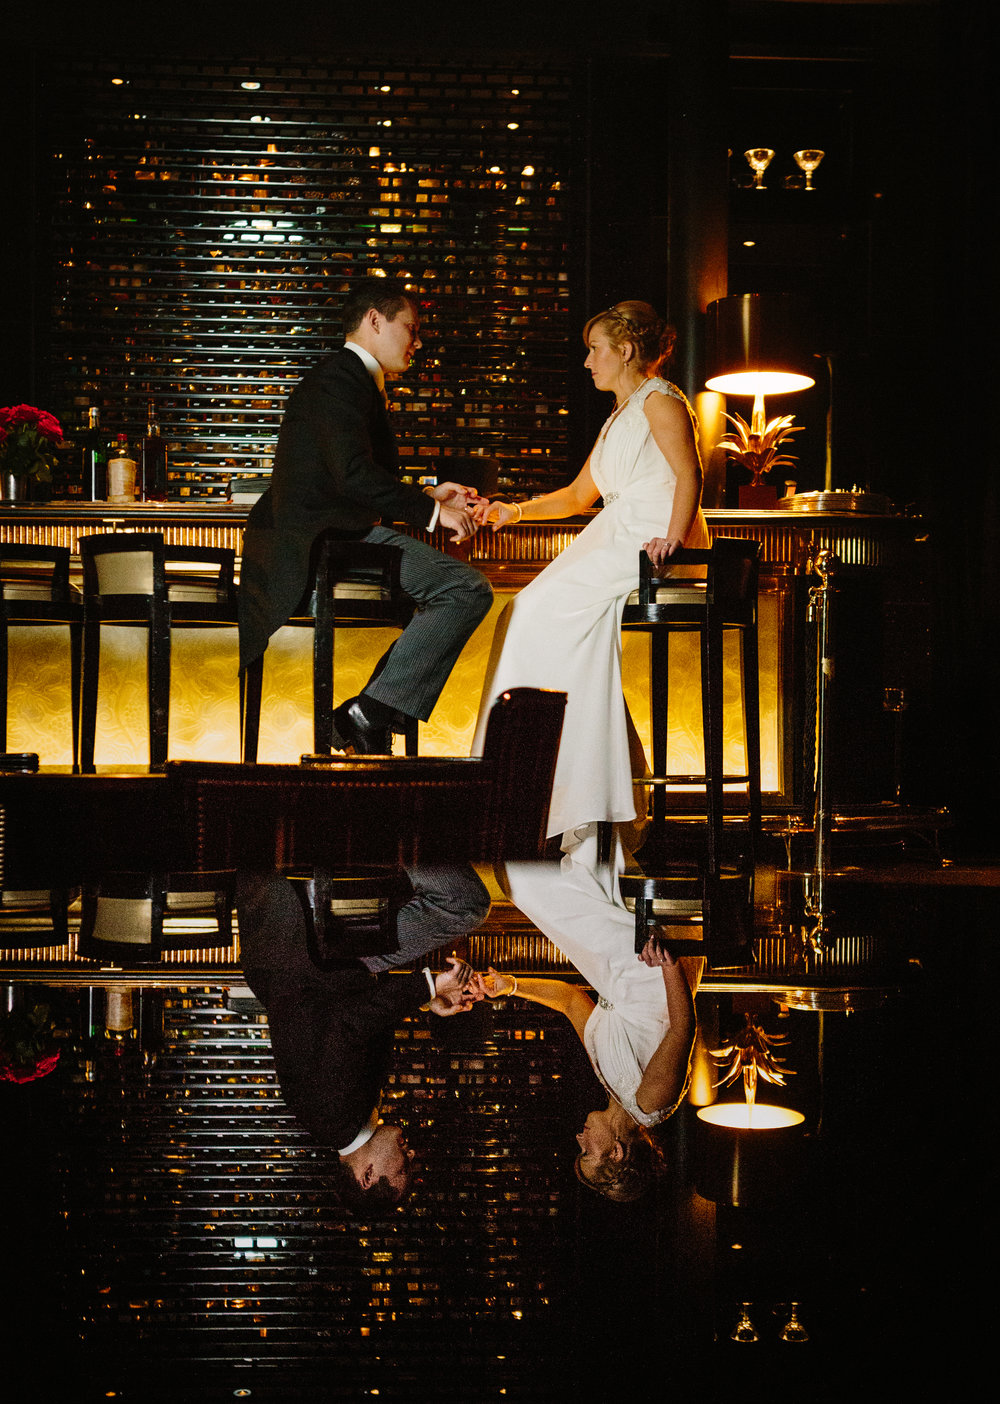 london-wedding-photography-wimbledon-wandsworth-town-hall-savoy-hotel-bridal-portrait-beaufort-bar-72